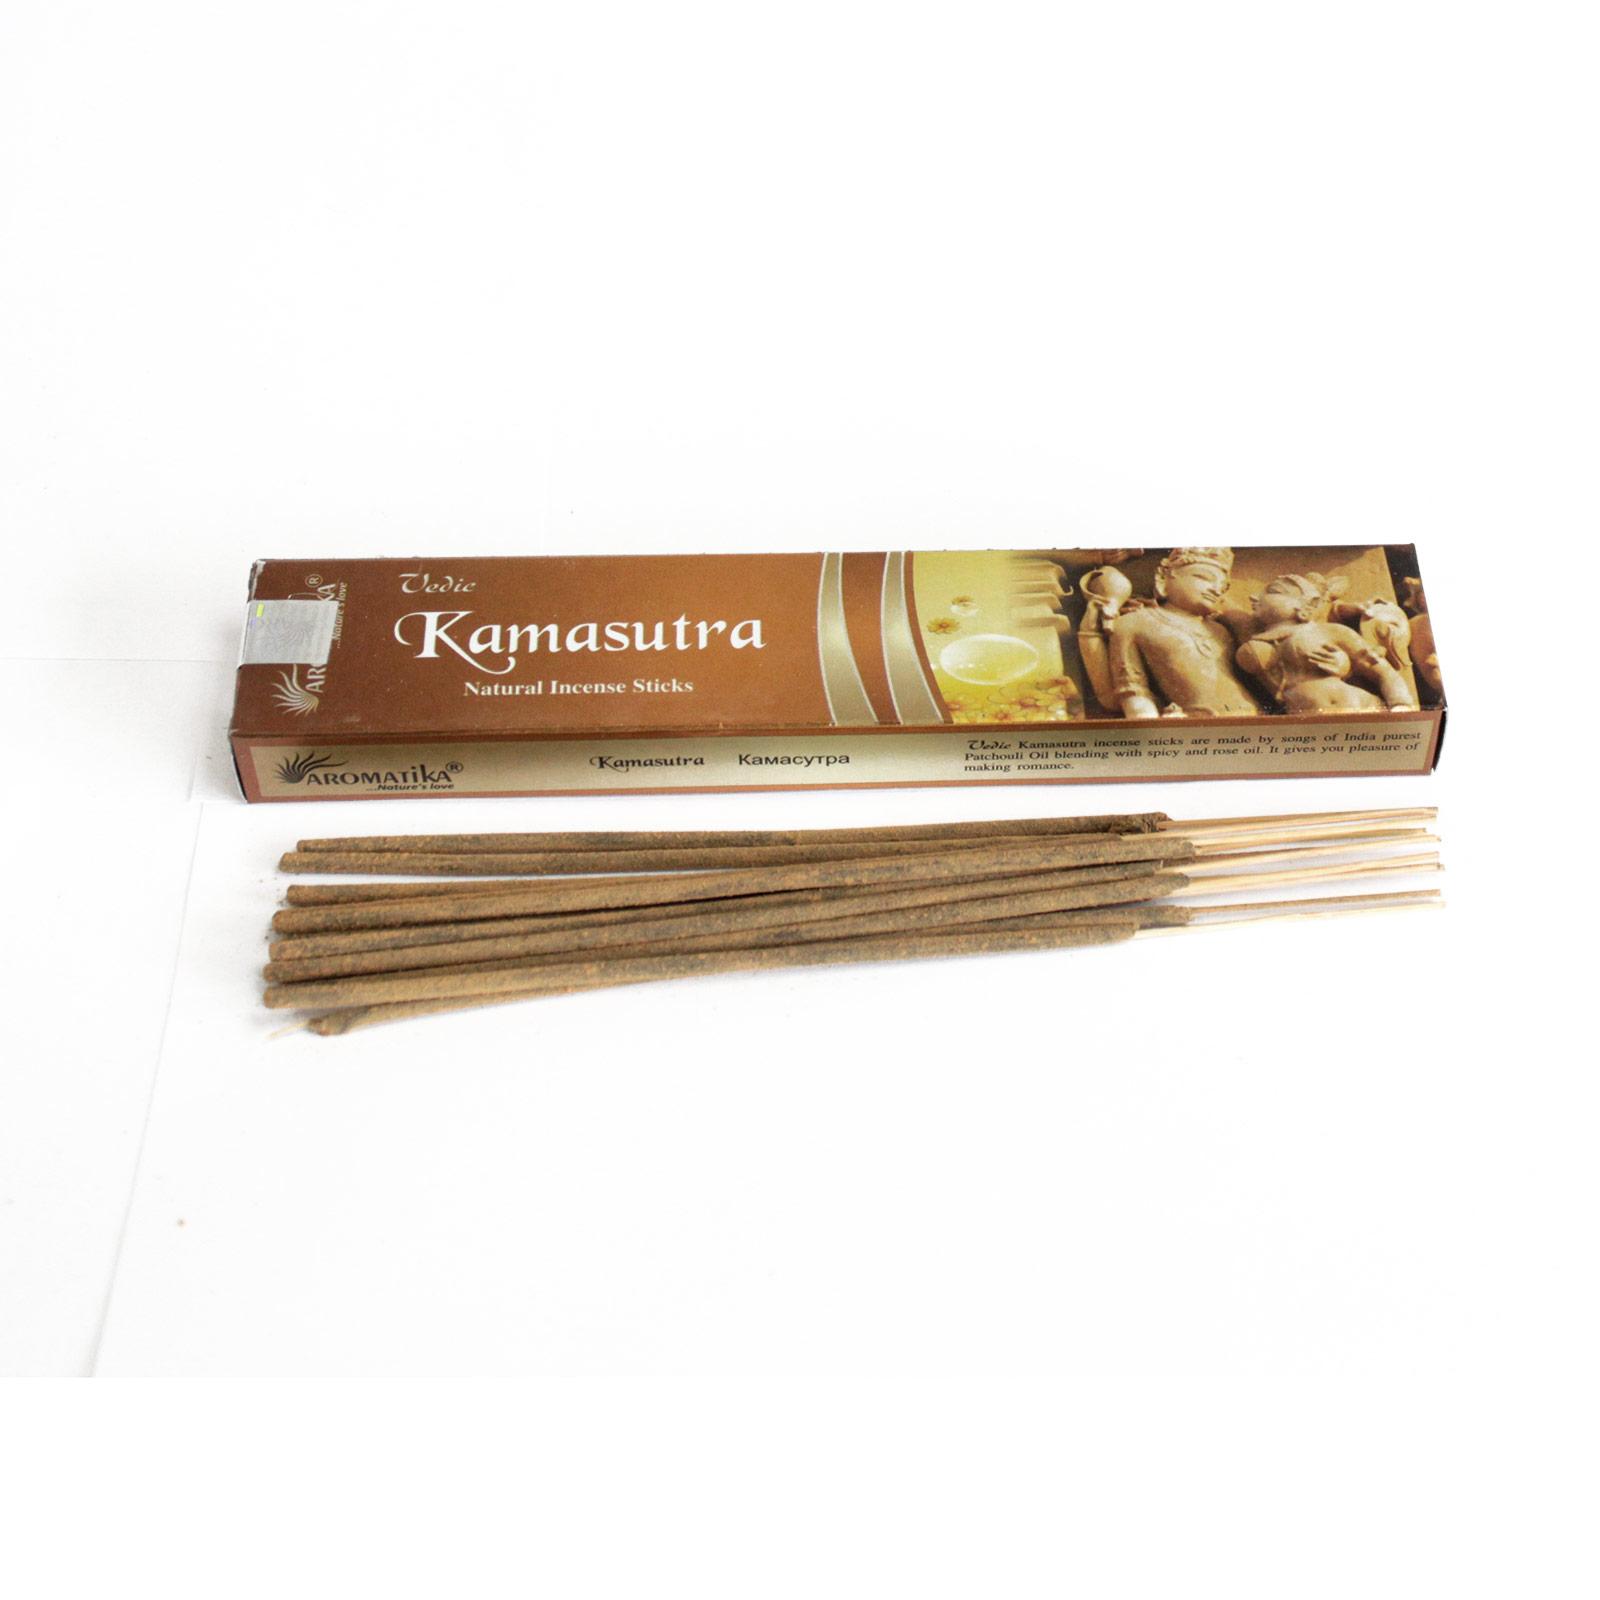 Vedic -Incense Sticks - Kamasutra